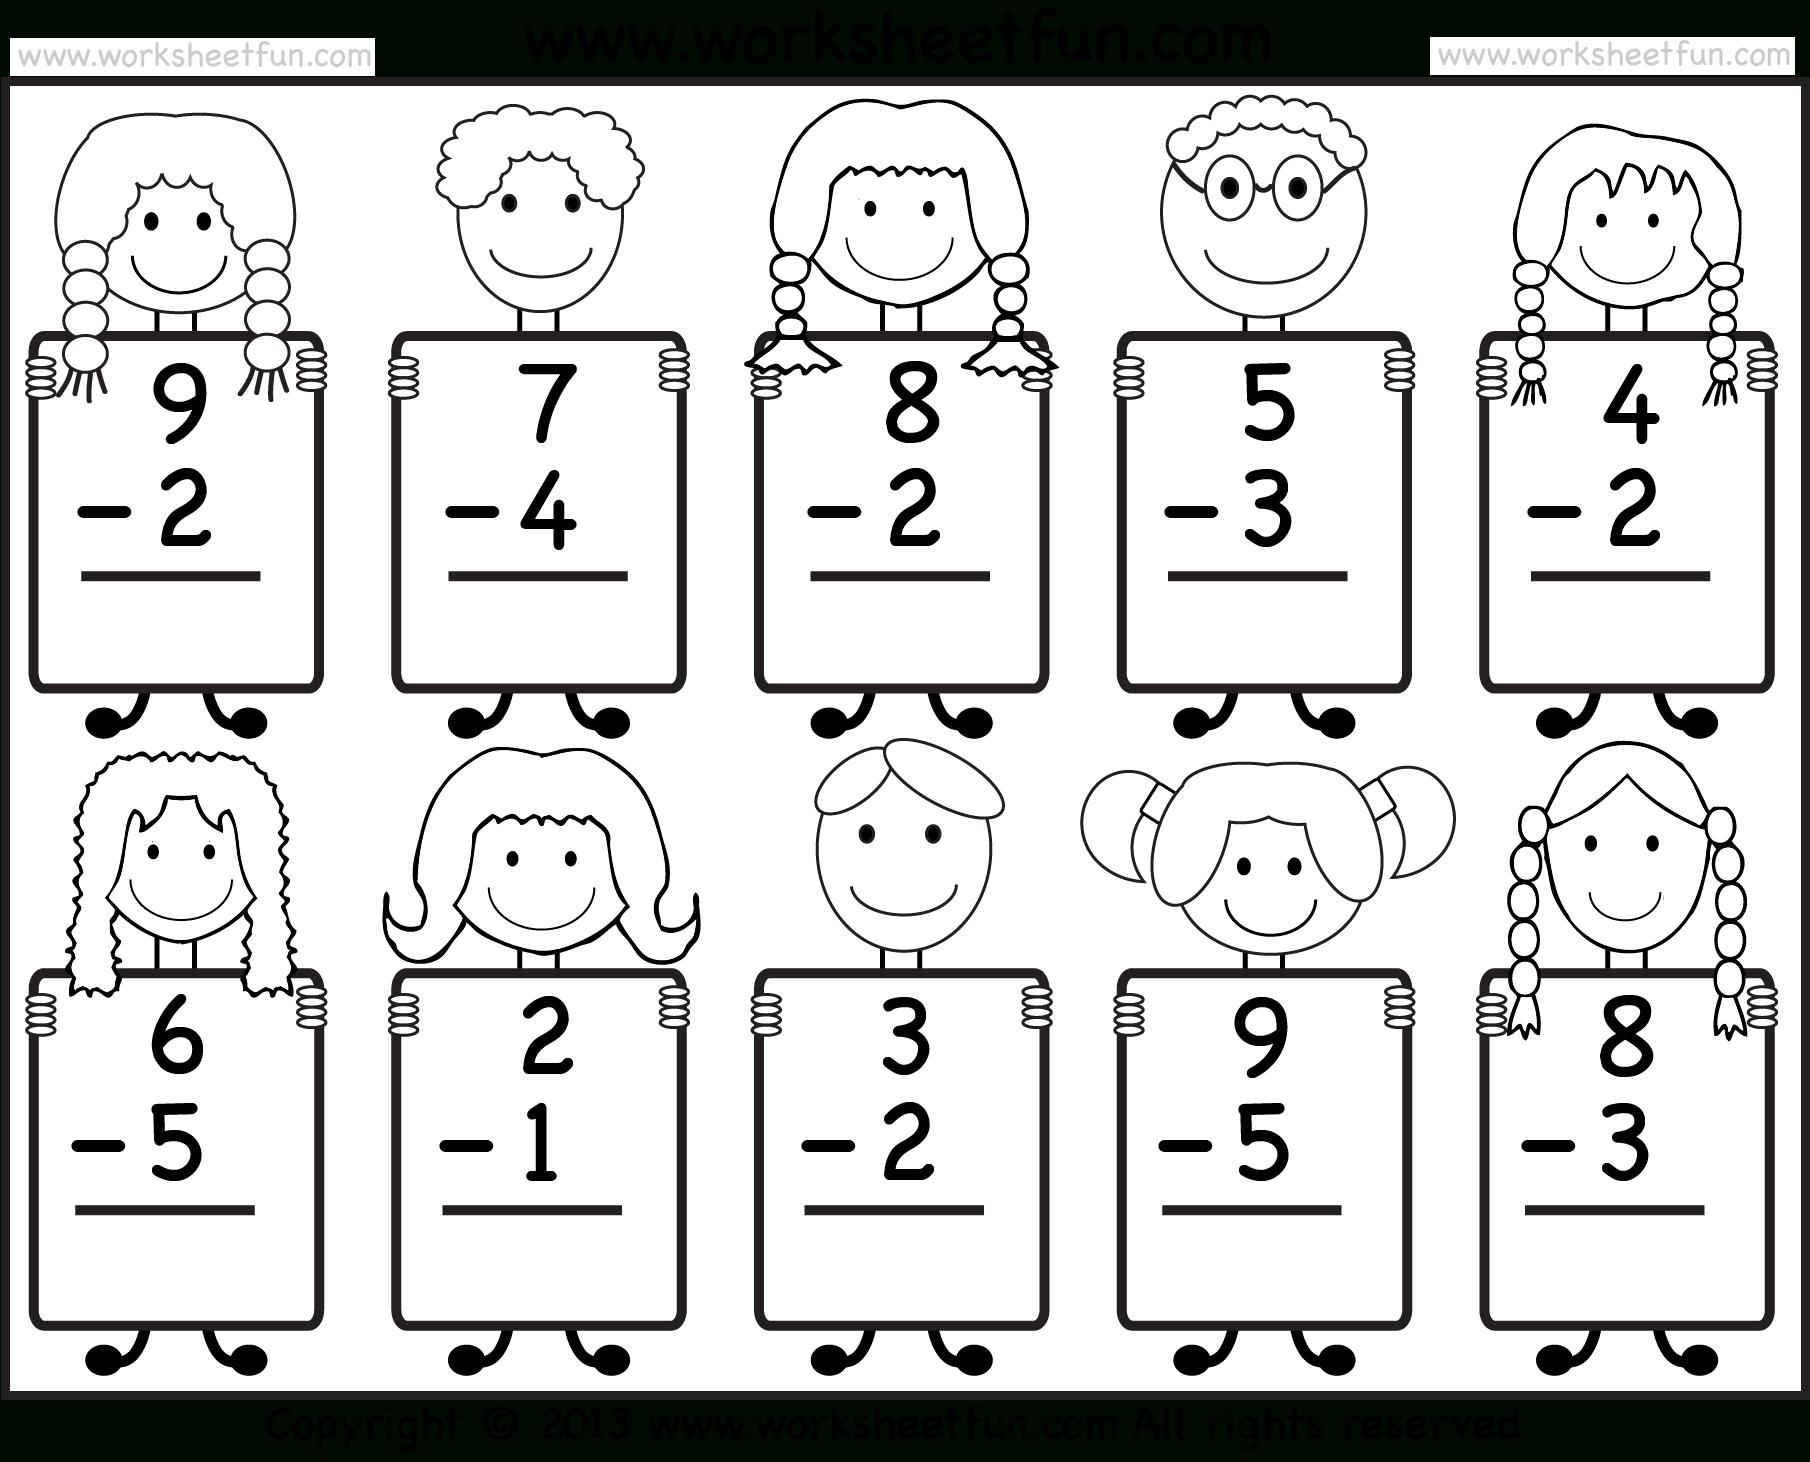 Free Printable Sheets For Kindergarten